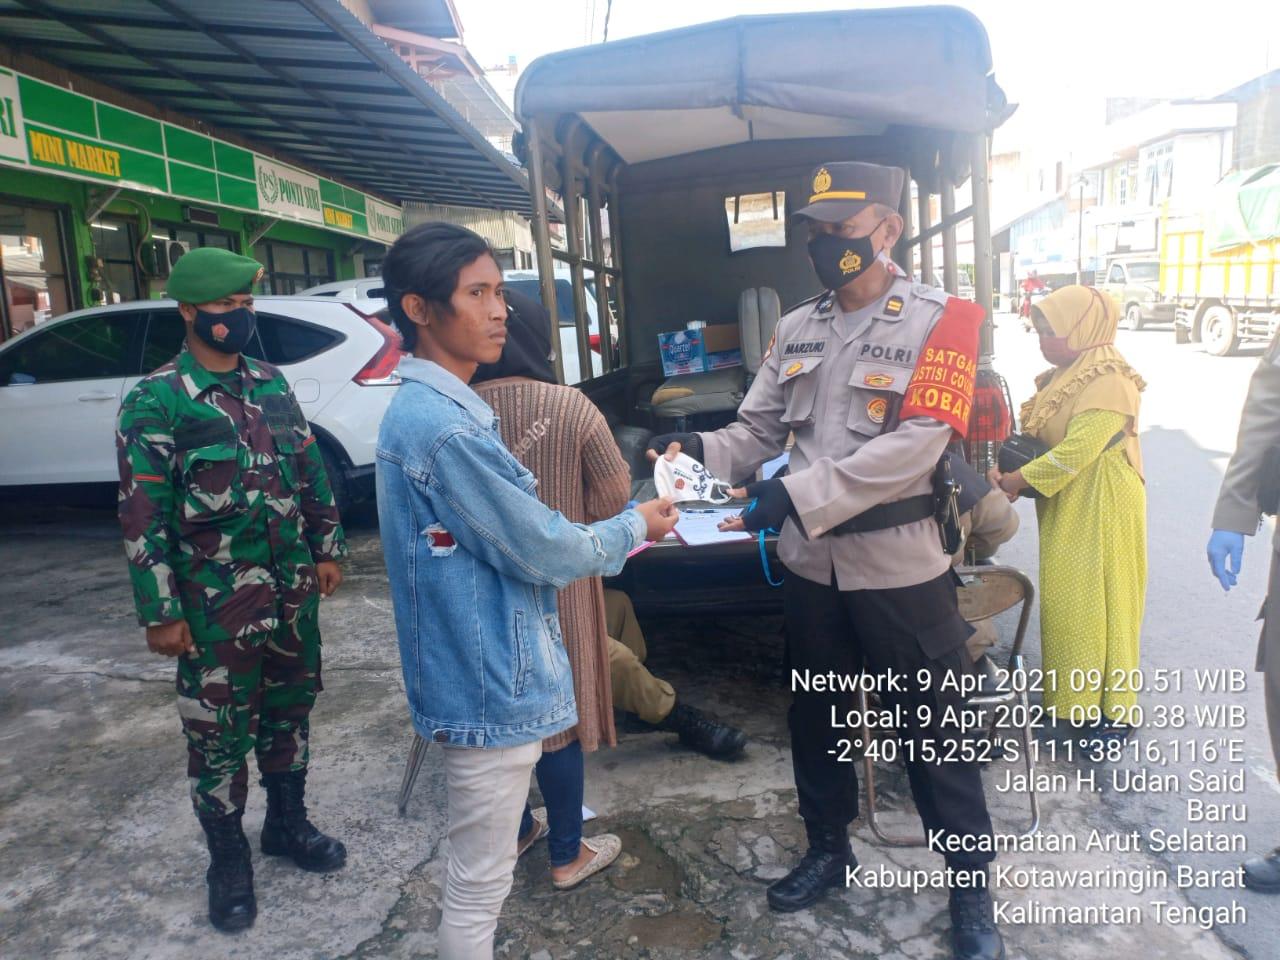 TNI/Polri dan Pol PP, Satgas Gabungan Laksanakan Operasi Yustisi